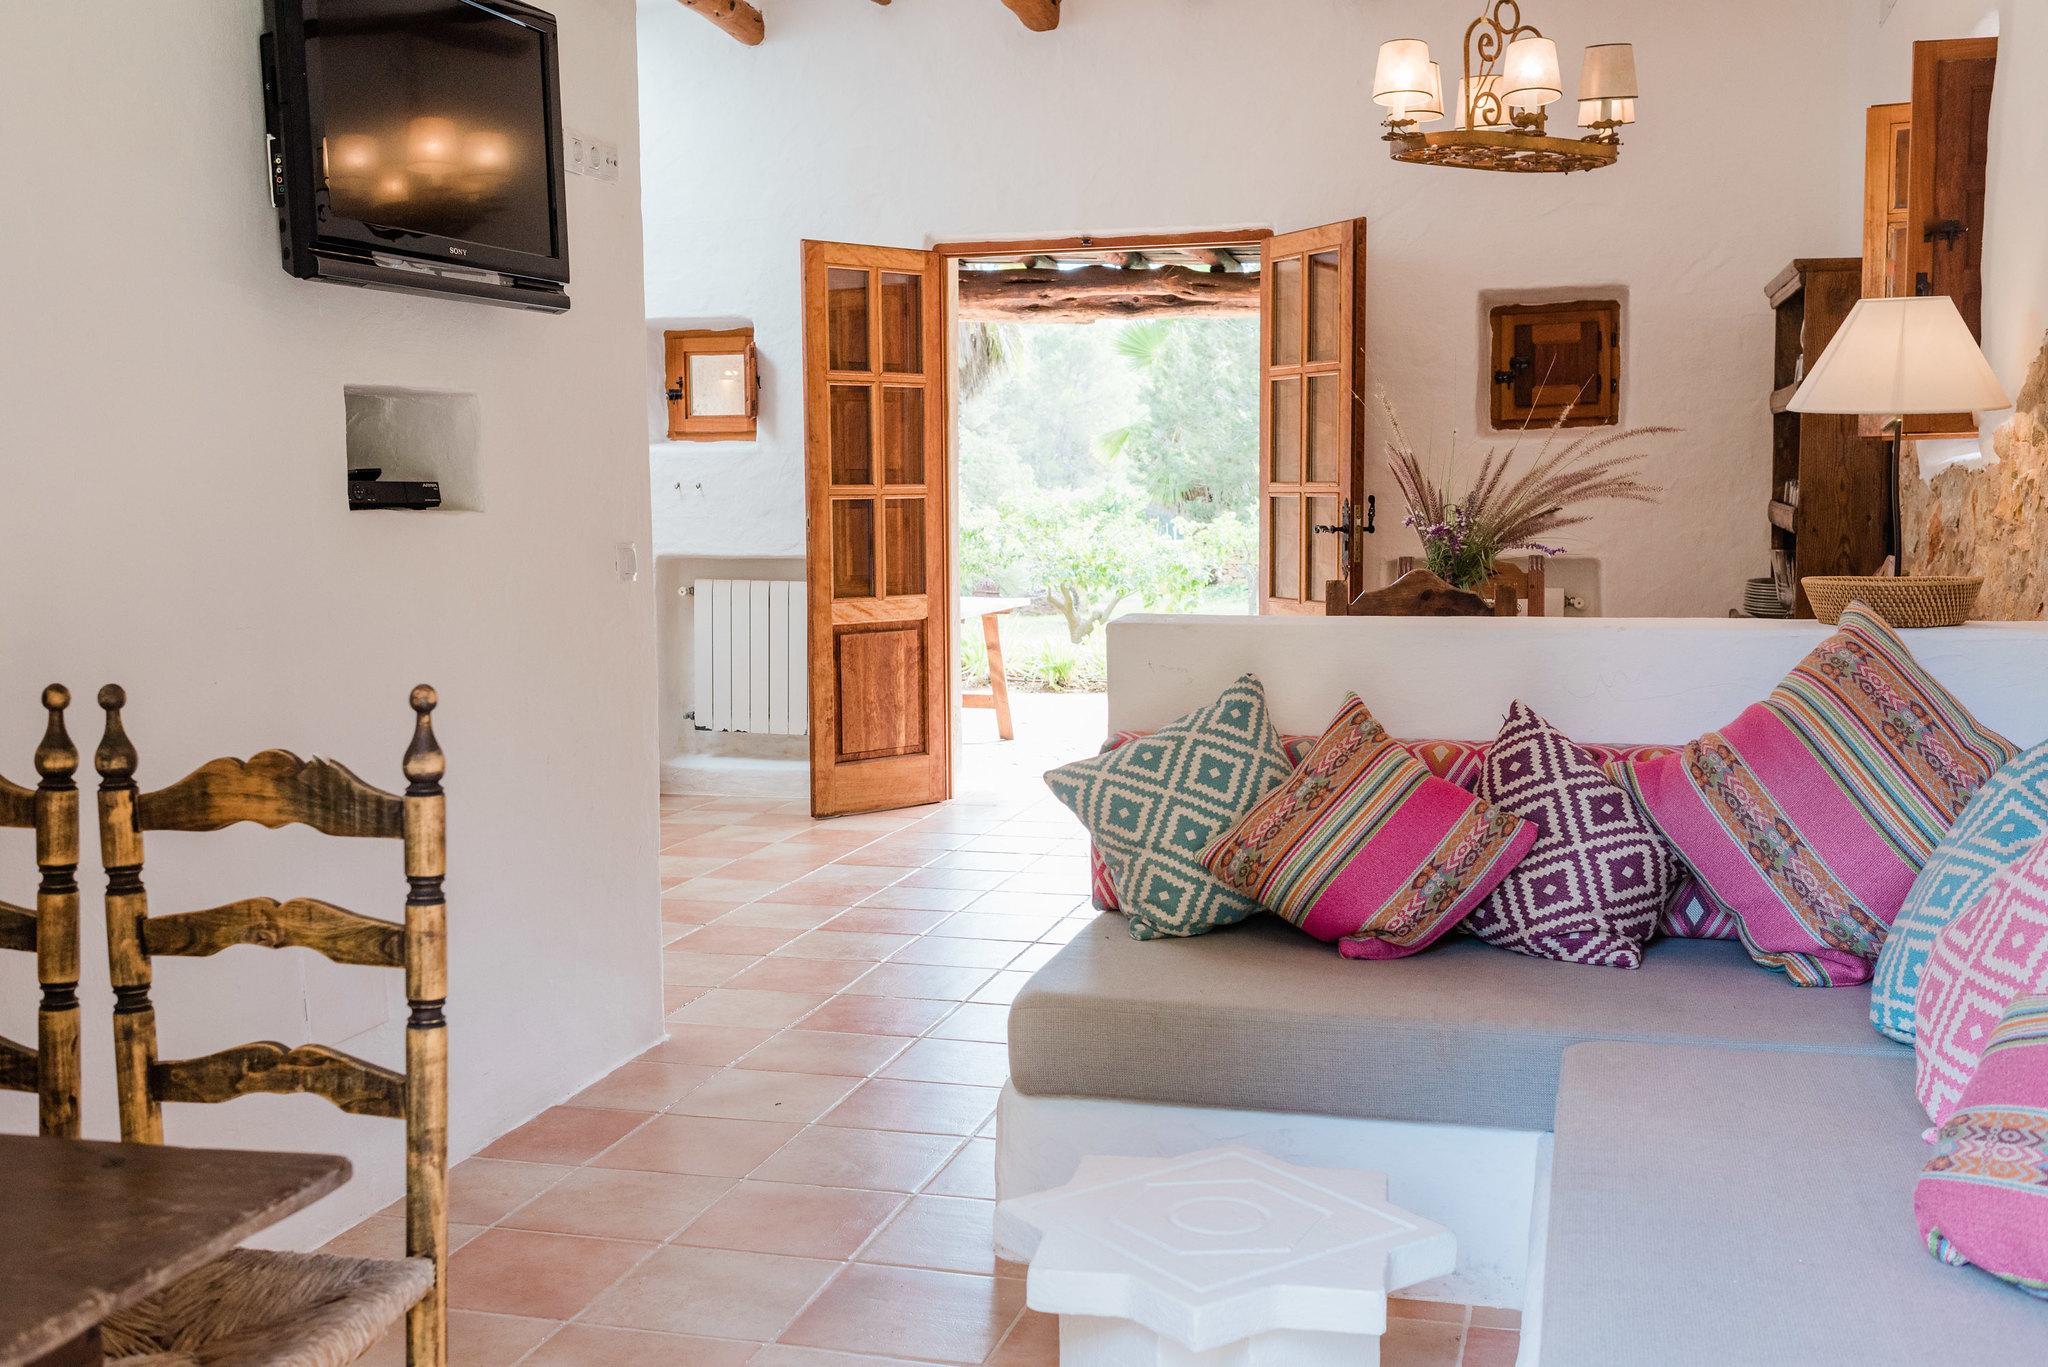 https://www.white-ibiza.com/wp-content/uploads/2020/05/white-ibiza-villas-can-sabina-interior-seating-area.jpg